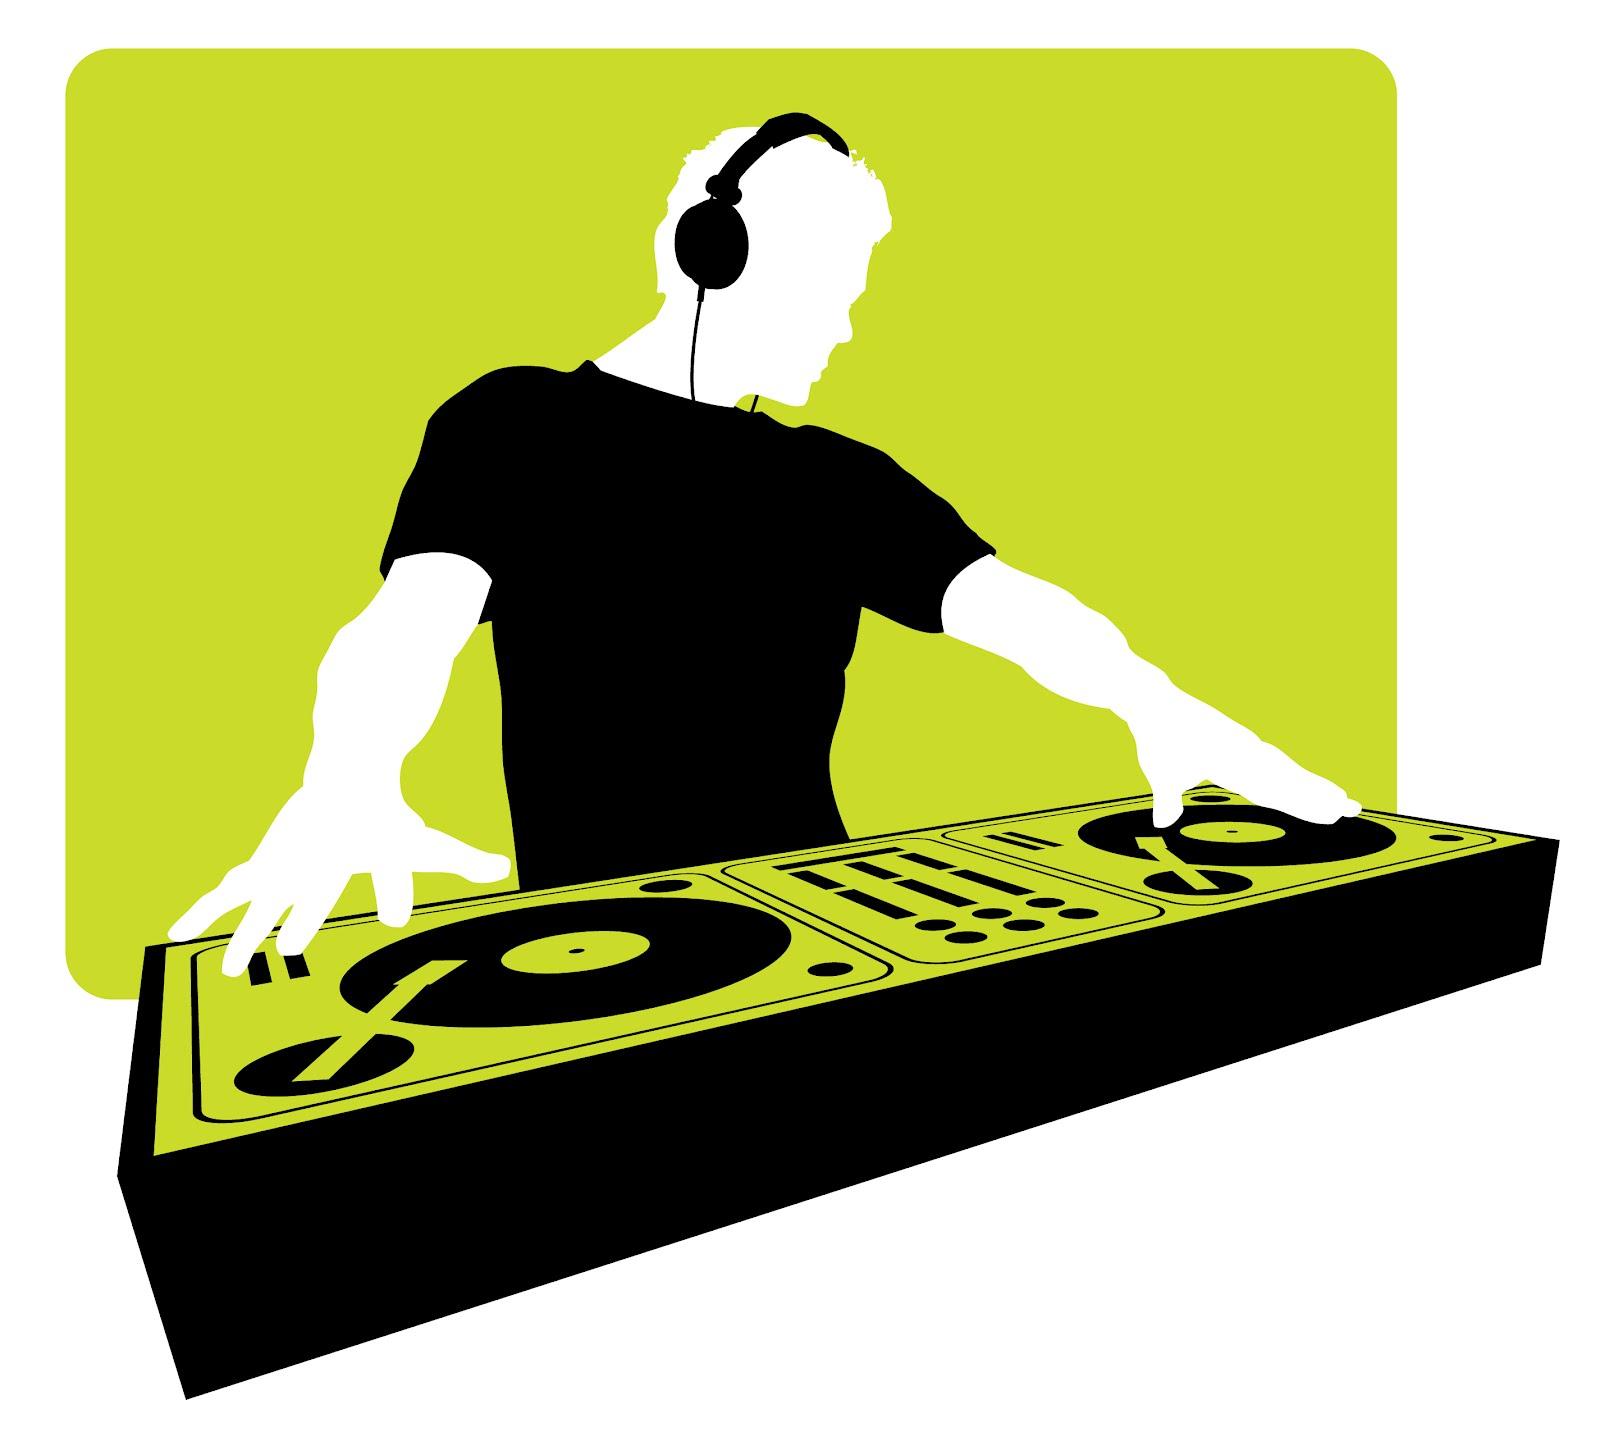 1600x1432 Free Dj Music Clipart Image Amp Free Dj Music Clip Art Image Images